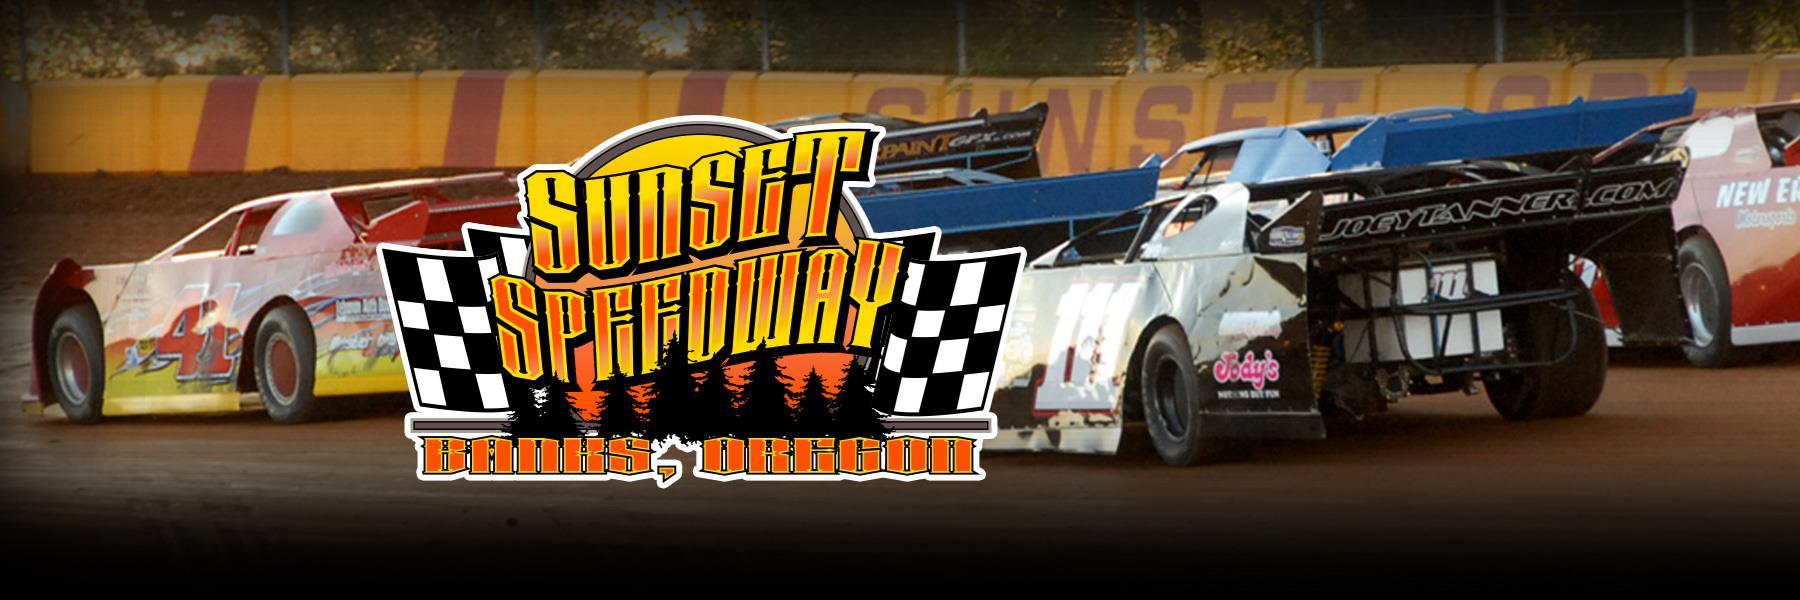 8/7/2021 - Sunset Speedway Park